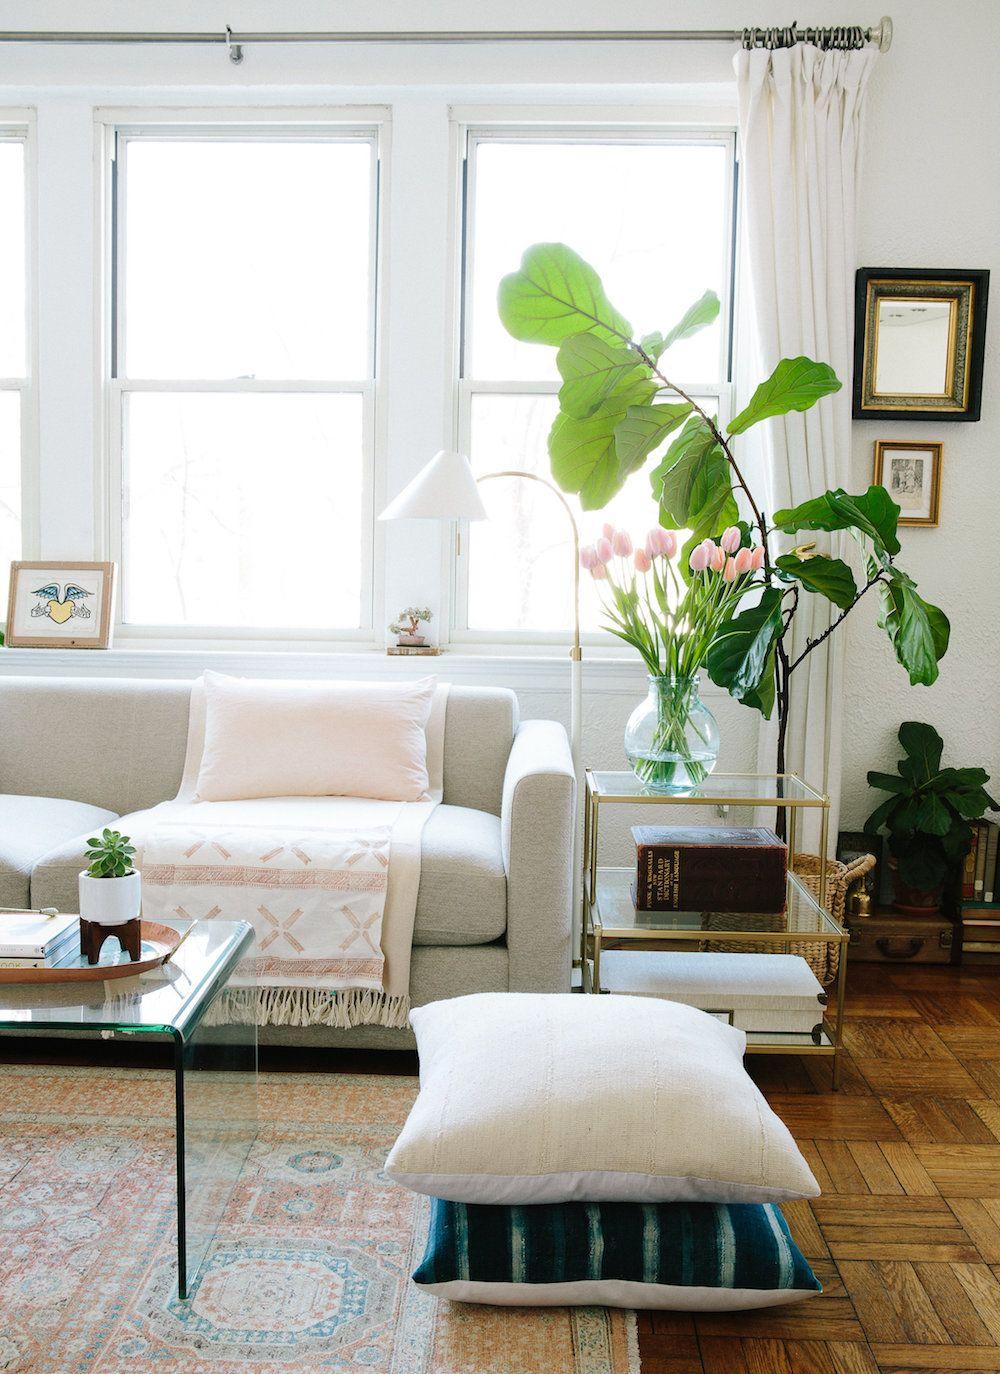 A Treehouse Apartment in Washington D.C | Pinterest | Apartments ...